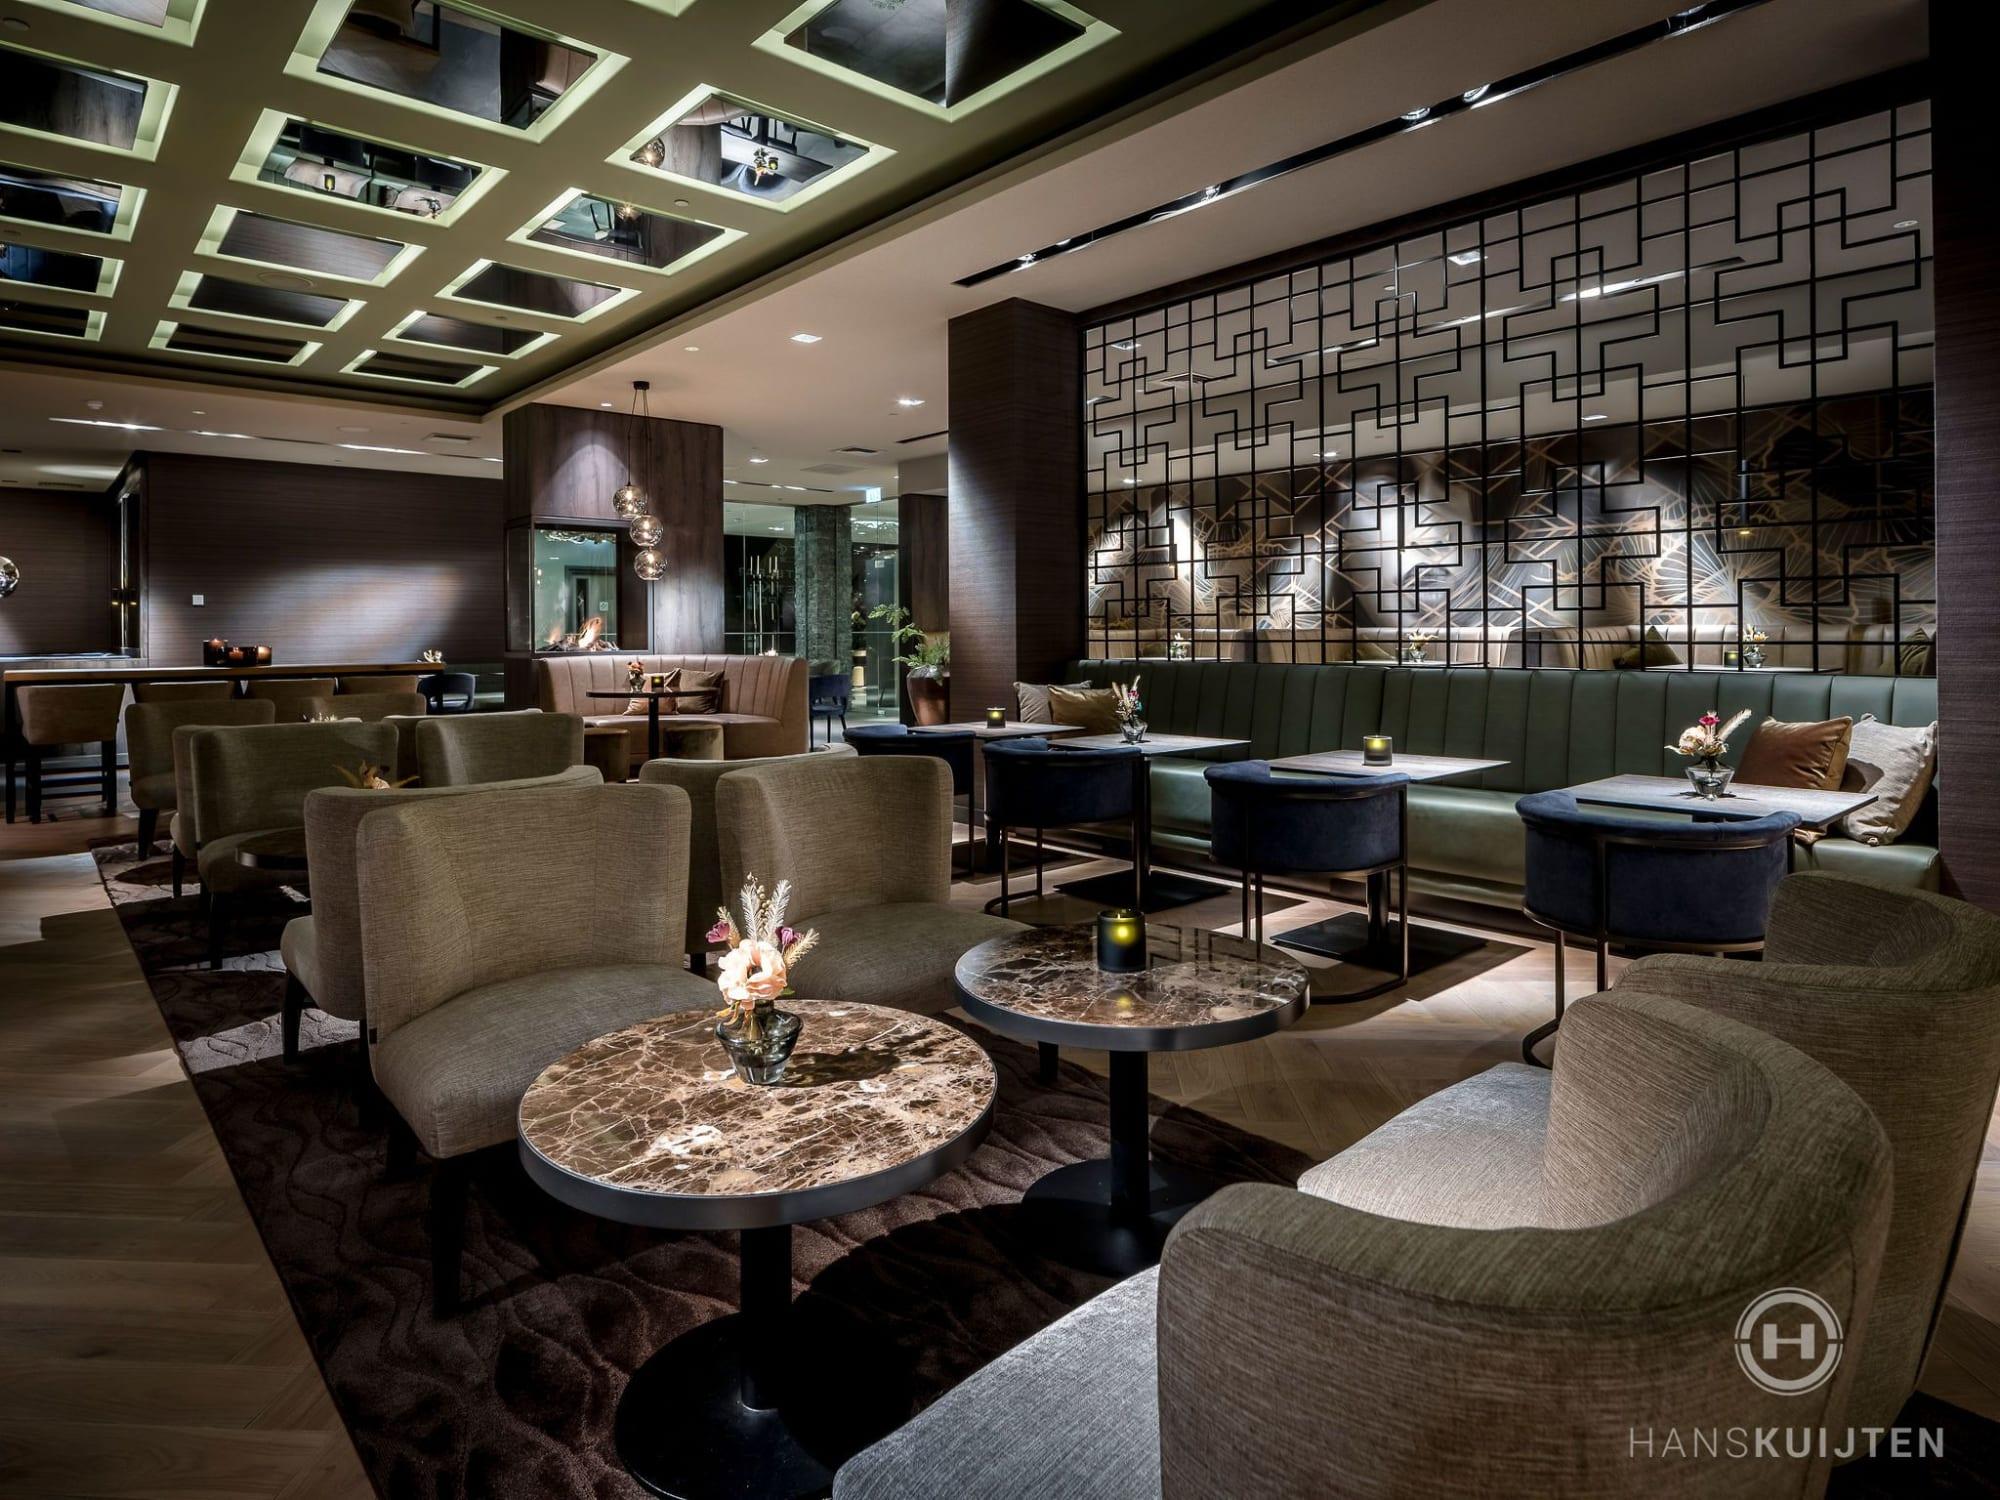 Interior Design by Hans Kuijten seen at Van der Valk Hotel Dordrecht, Dordrecht - Hotel Bar Dordrecht